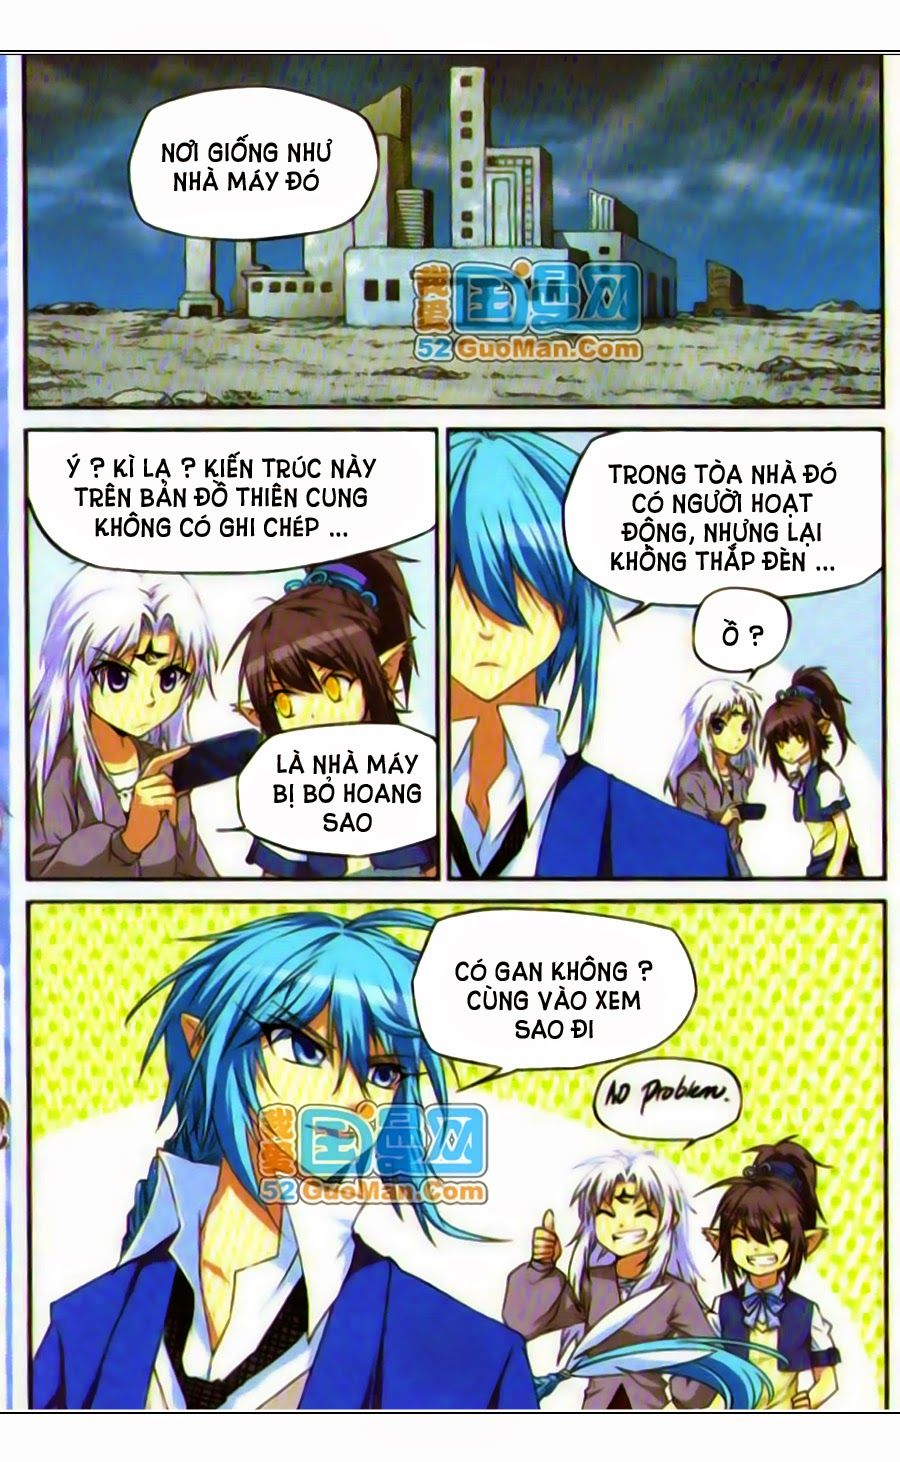 a3manga.com tam nhan hao thien luc chap 14